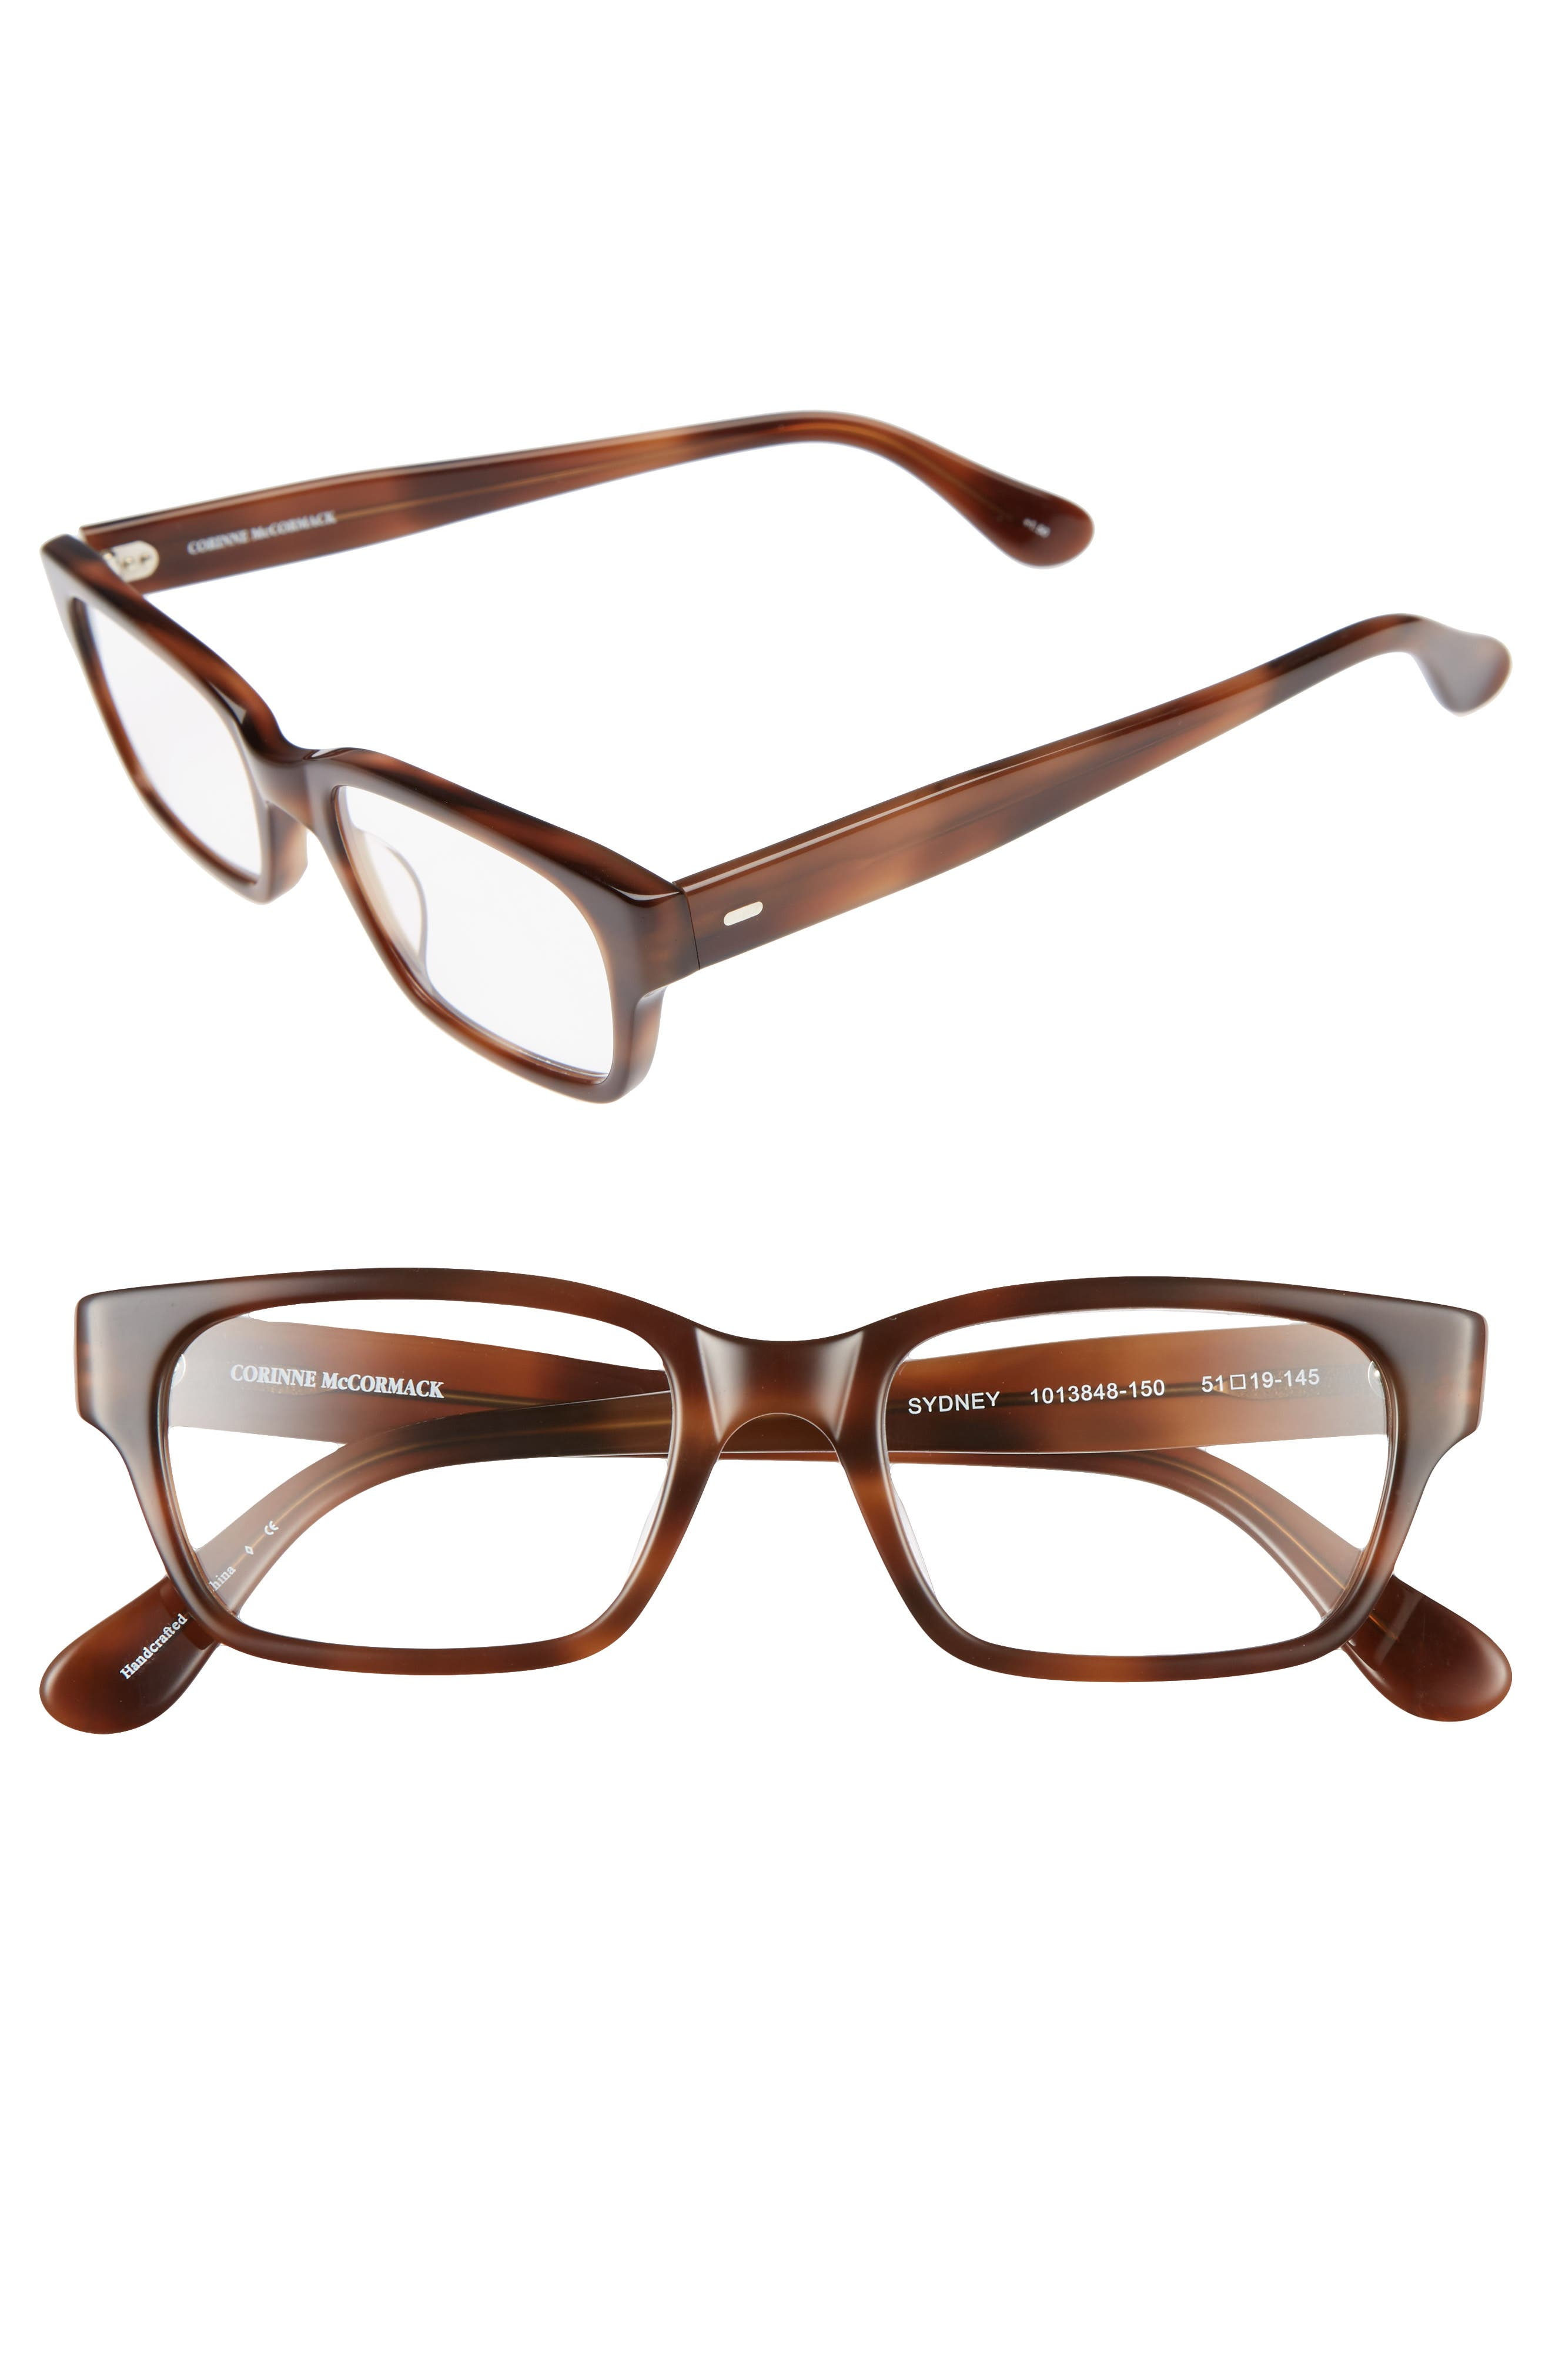 Sydney 51mm Reading Glasses,                             Main thumbnail 1, color,                             200